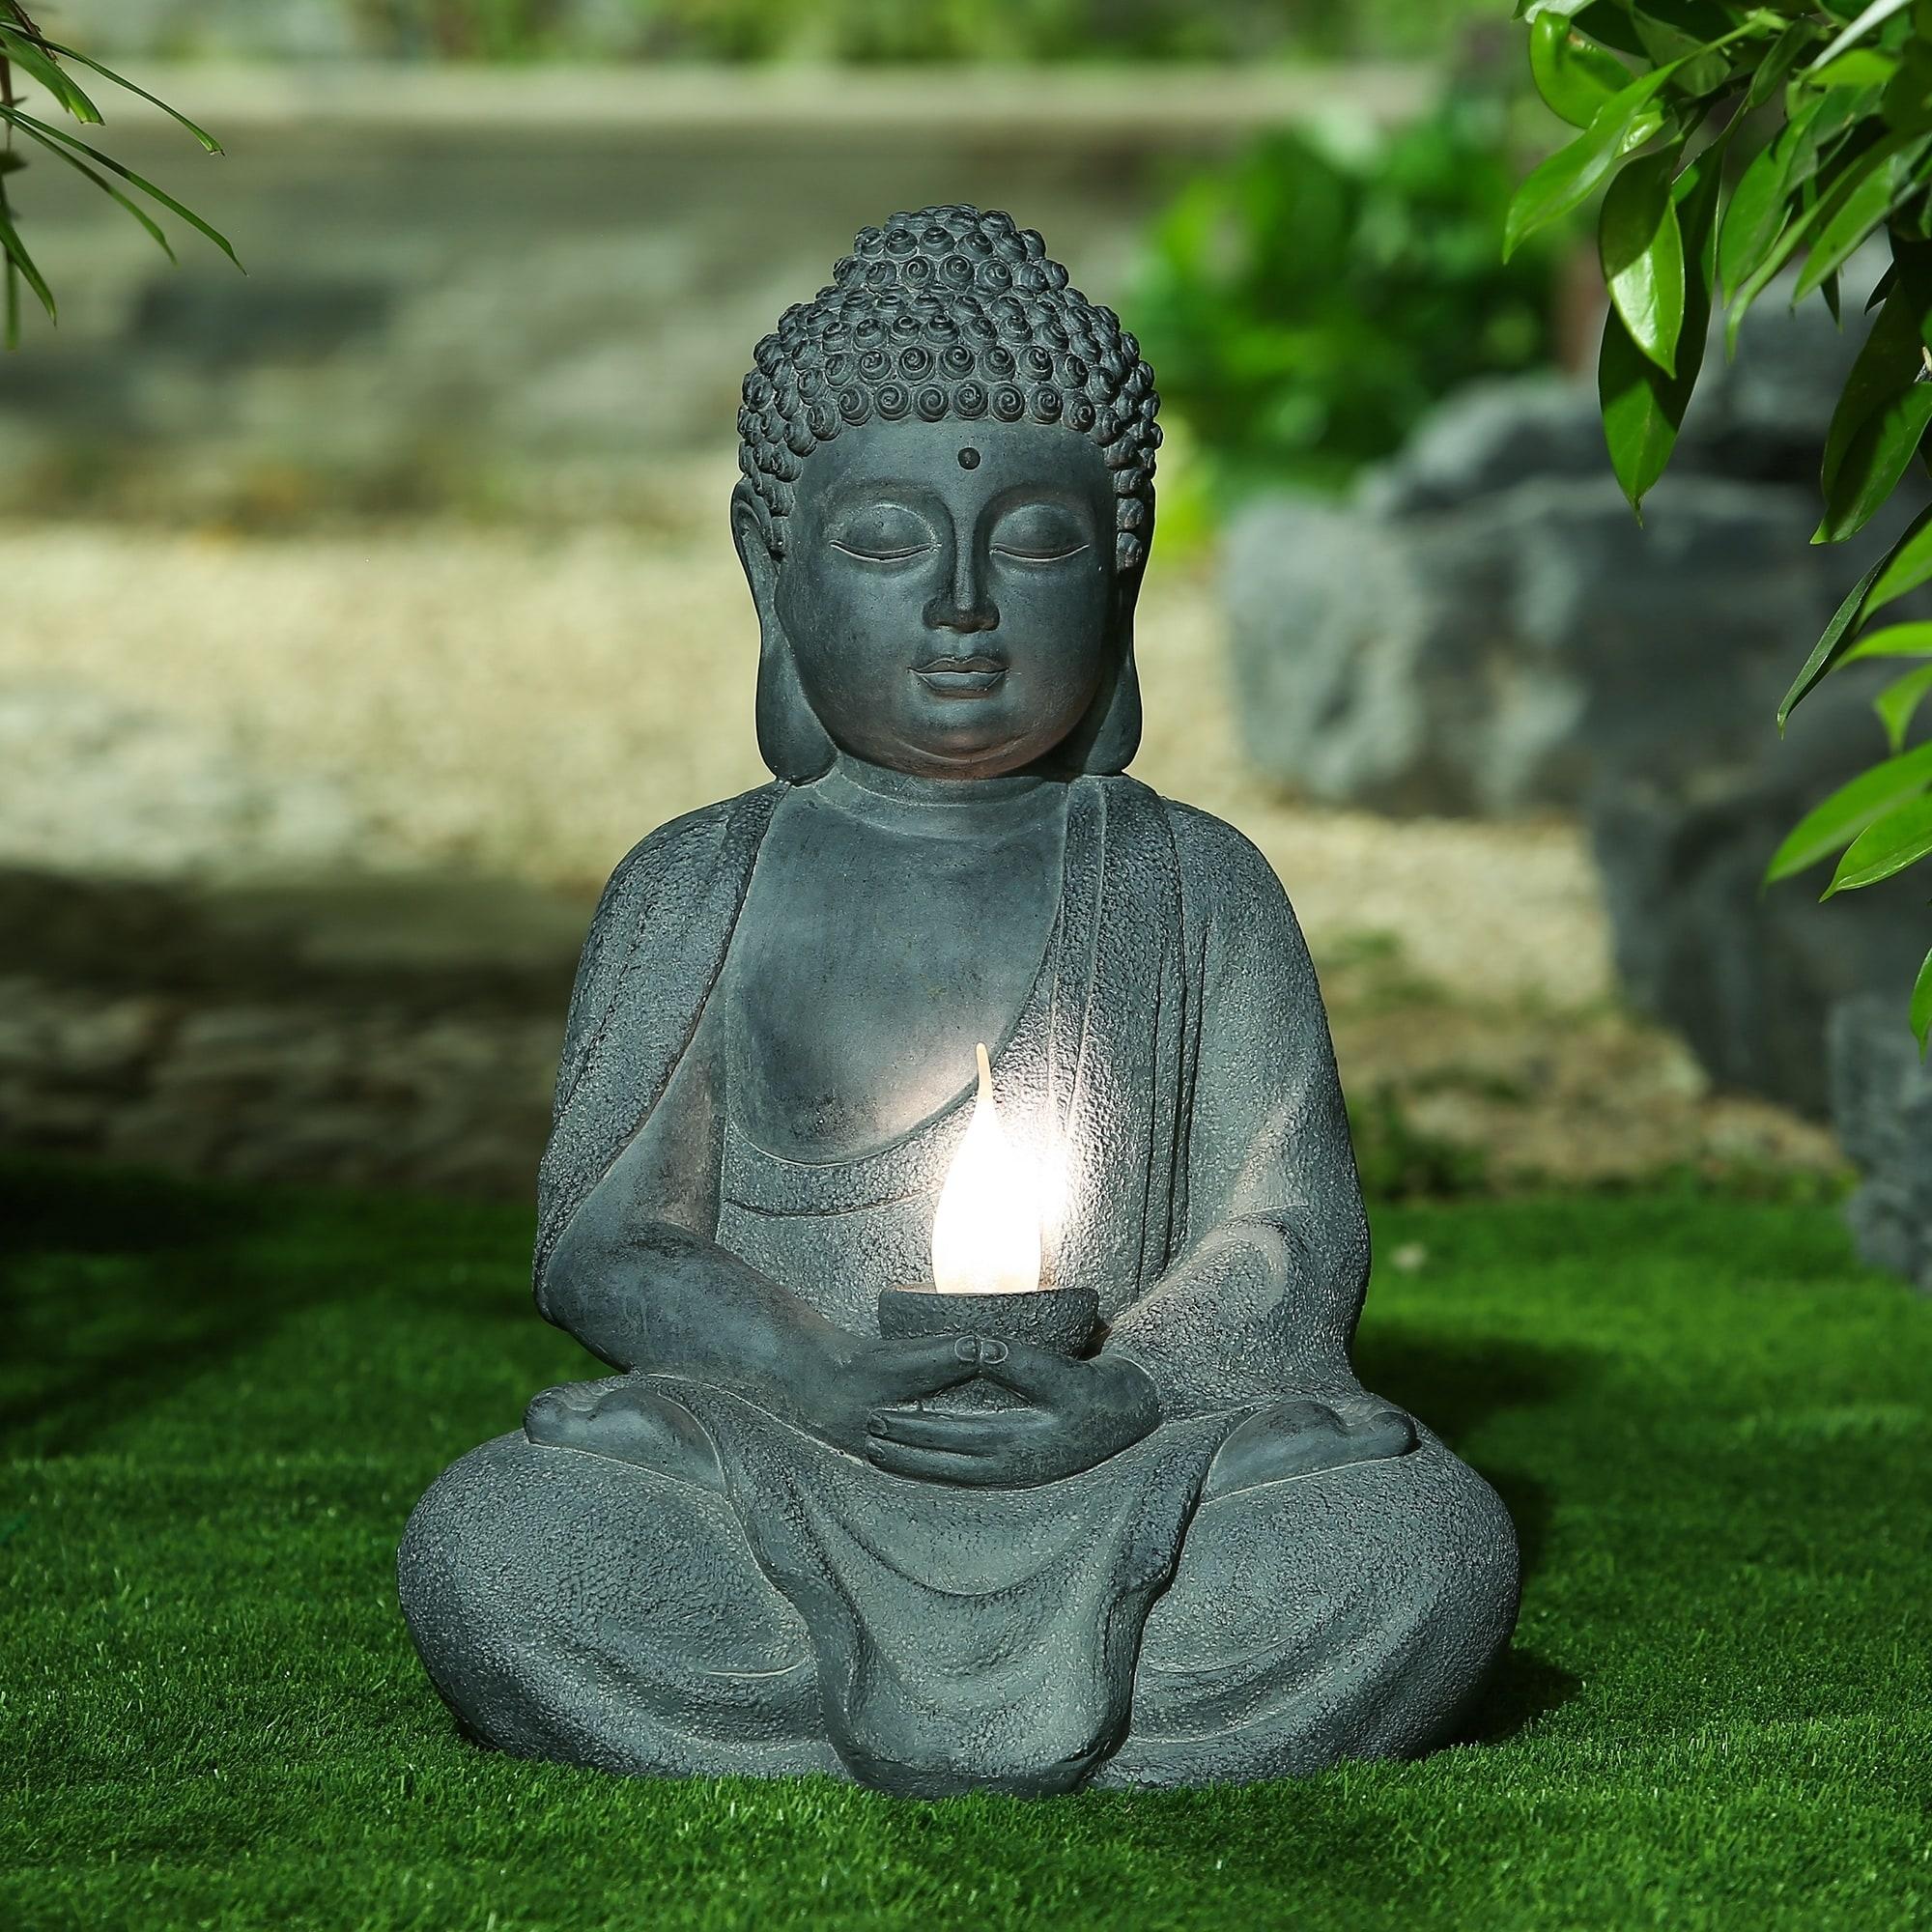 Buy Garden Statues Garden Accents Online at Overstock | Our